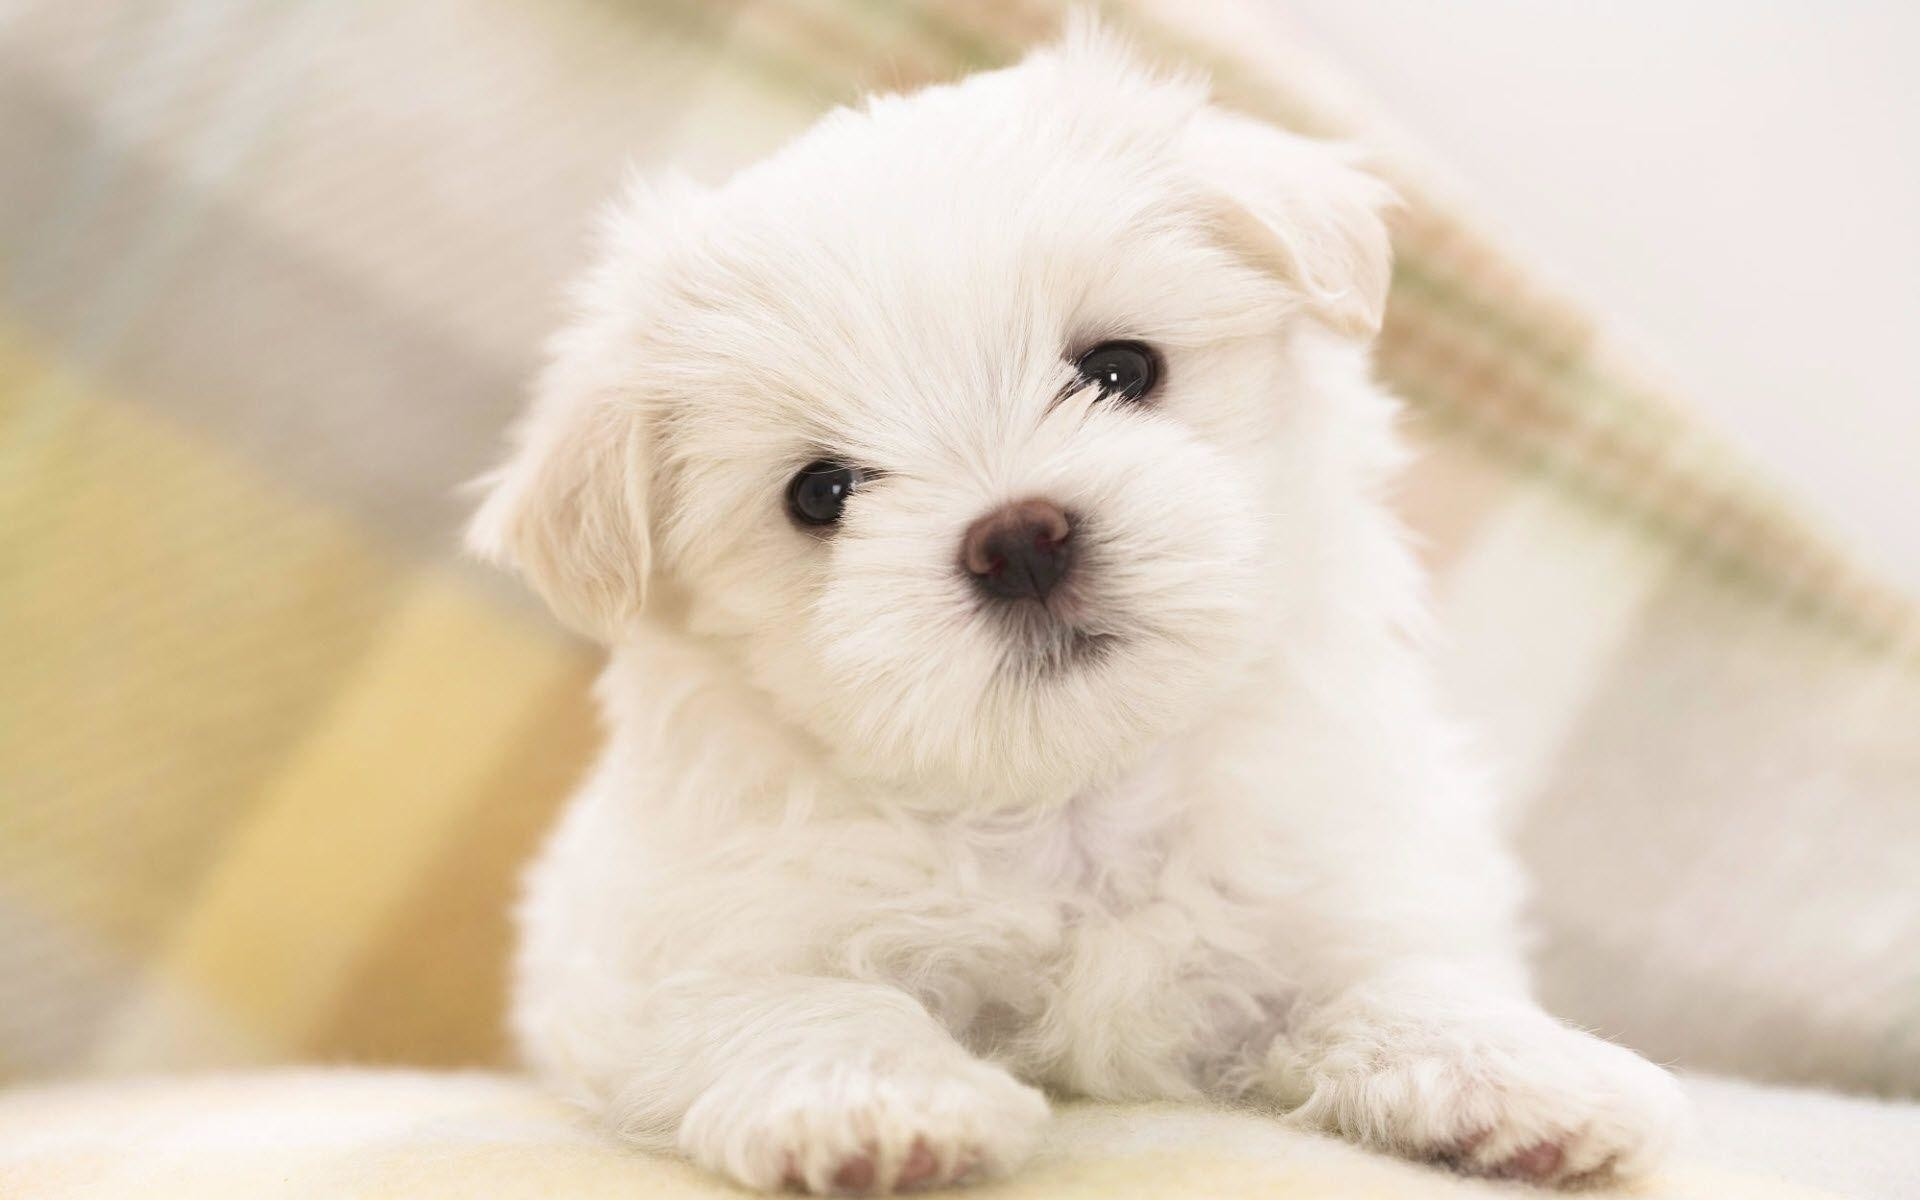 maltese puppy animal wallpaper | Desktop Backgrounds for Free HD .